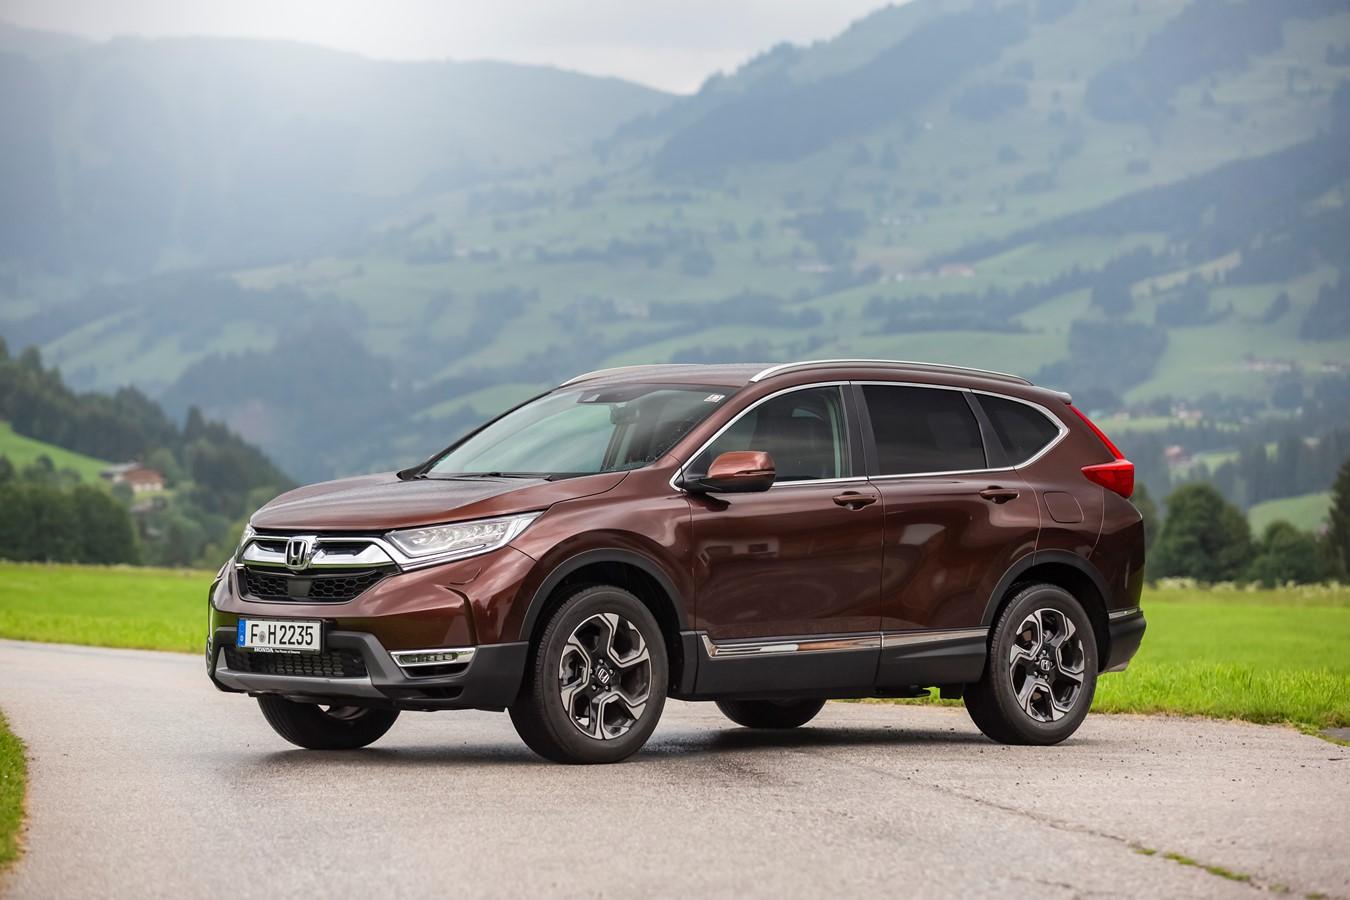 2018 Honda Cr V Vtec Turbo Petrol 2013 Sunroof Wiring Diagram